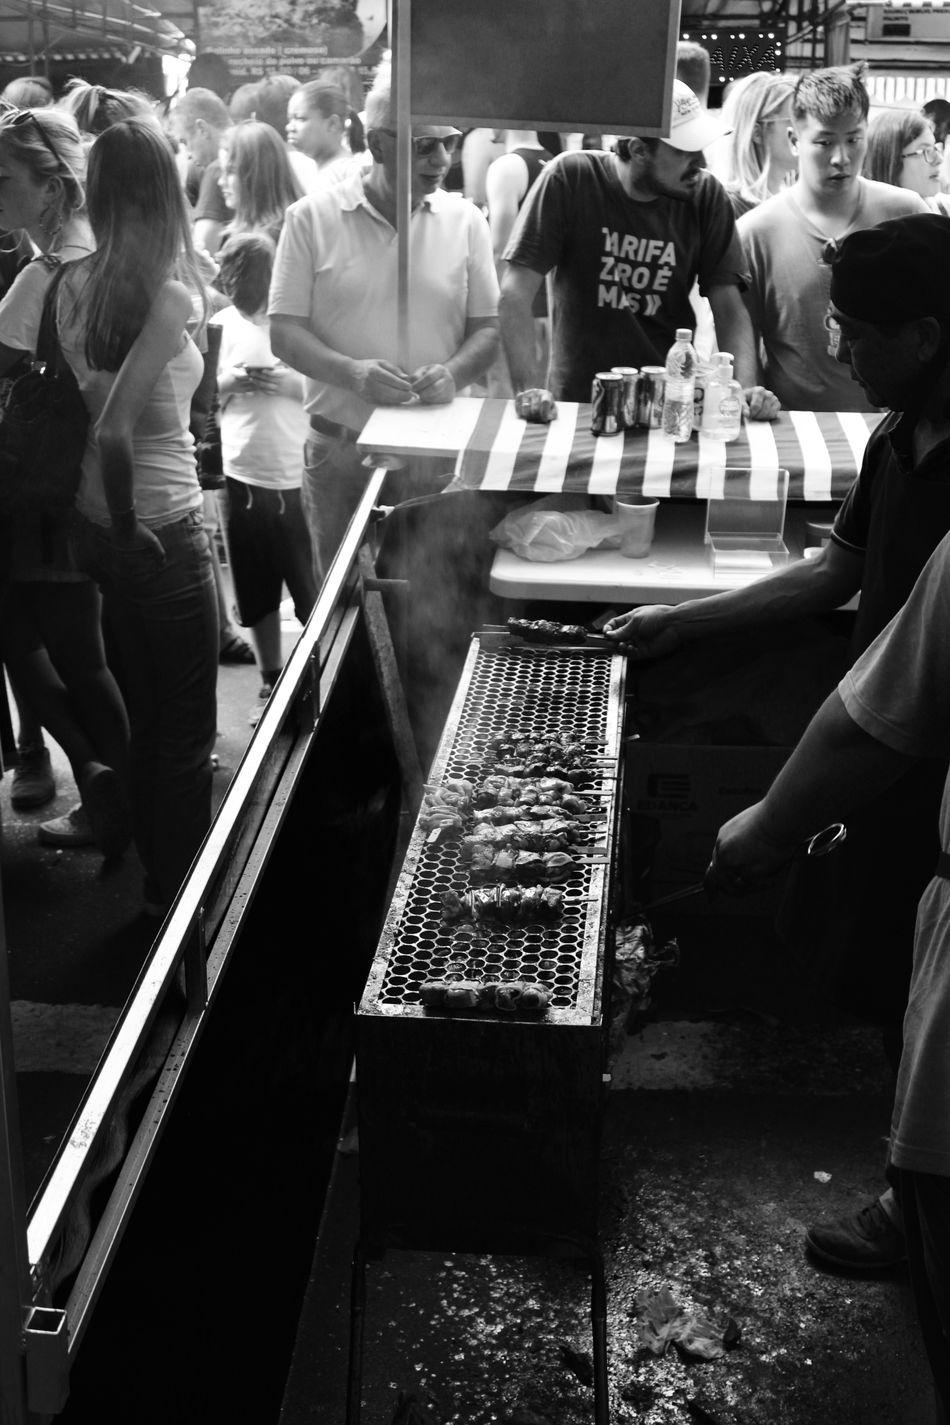 Feira Da Liberdade Sao Paulo - Brazil City Life Monochrome Photography Undergroundphotography Black And White Photography Blackandwhitephotography Dramatic Black And White Abundance Food And Drink Lifestyles Oriental Food  Oriental Style Japan Style Eat Eat And Eat